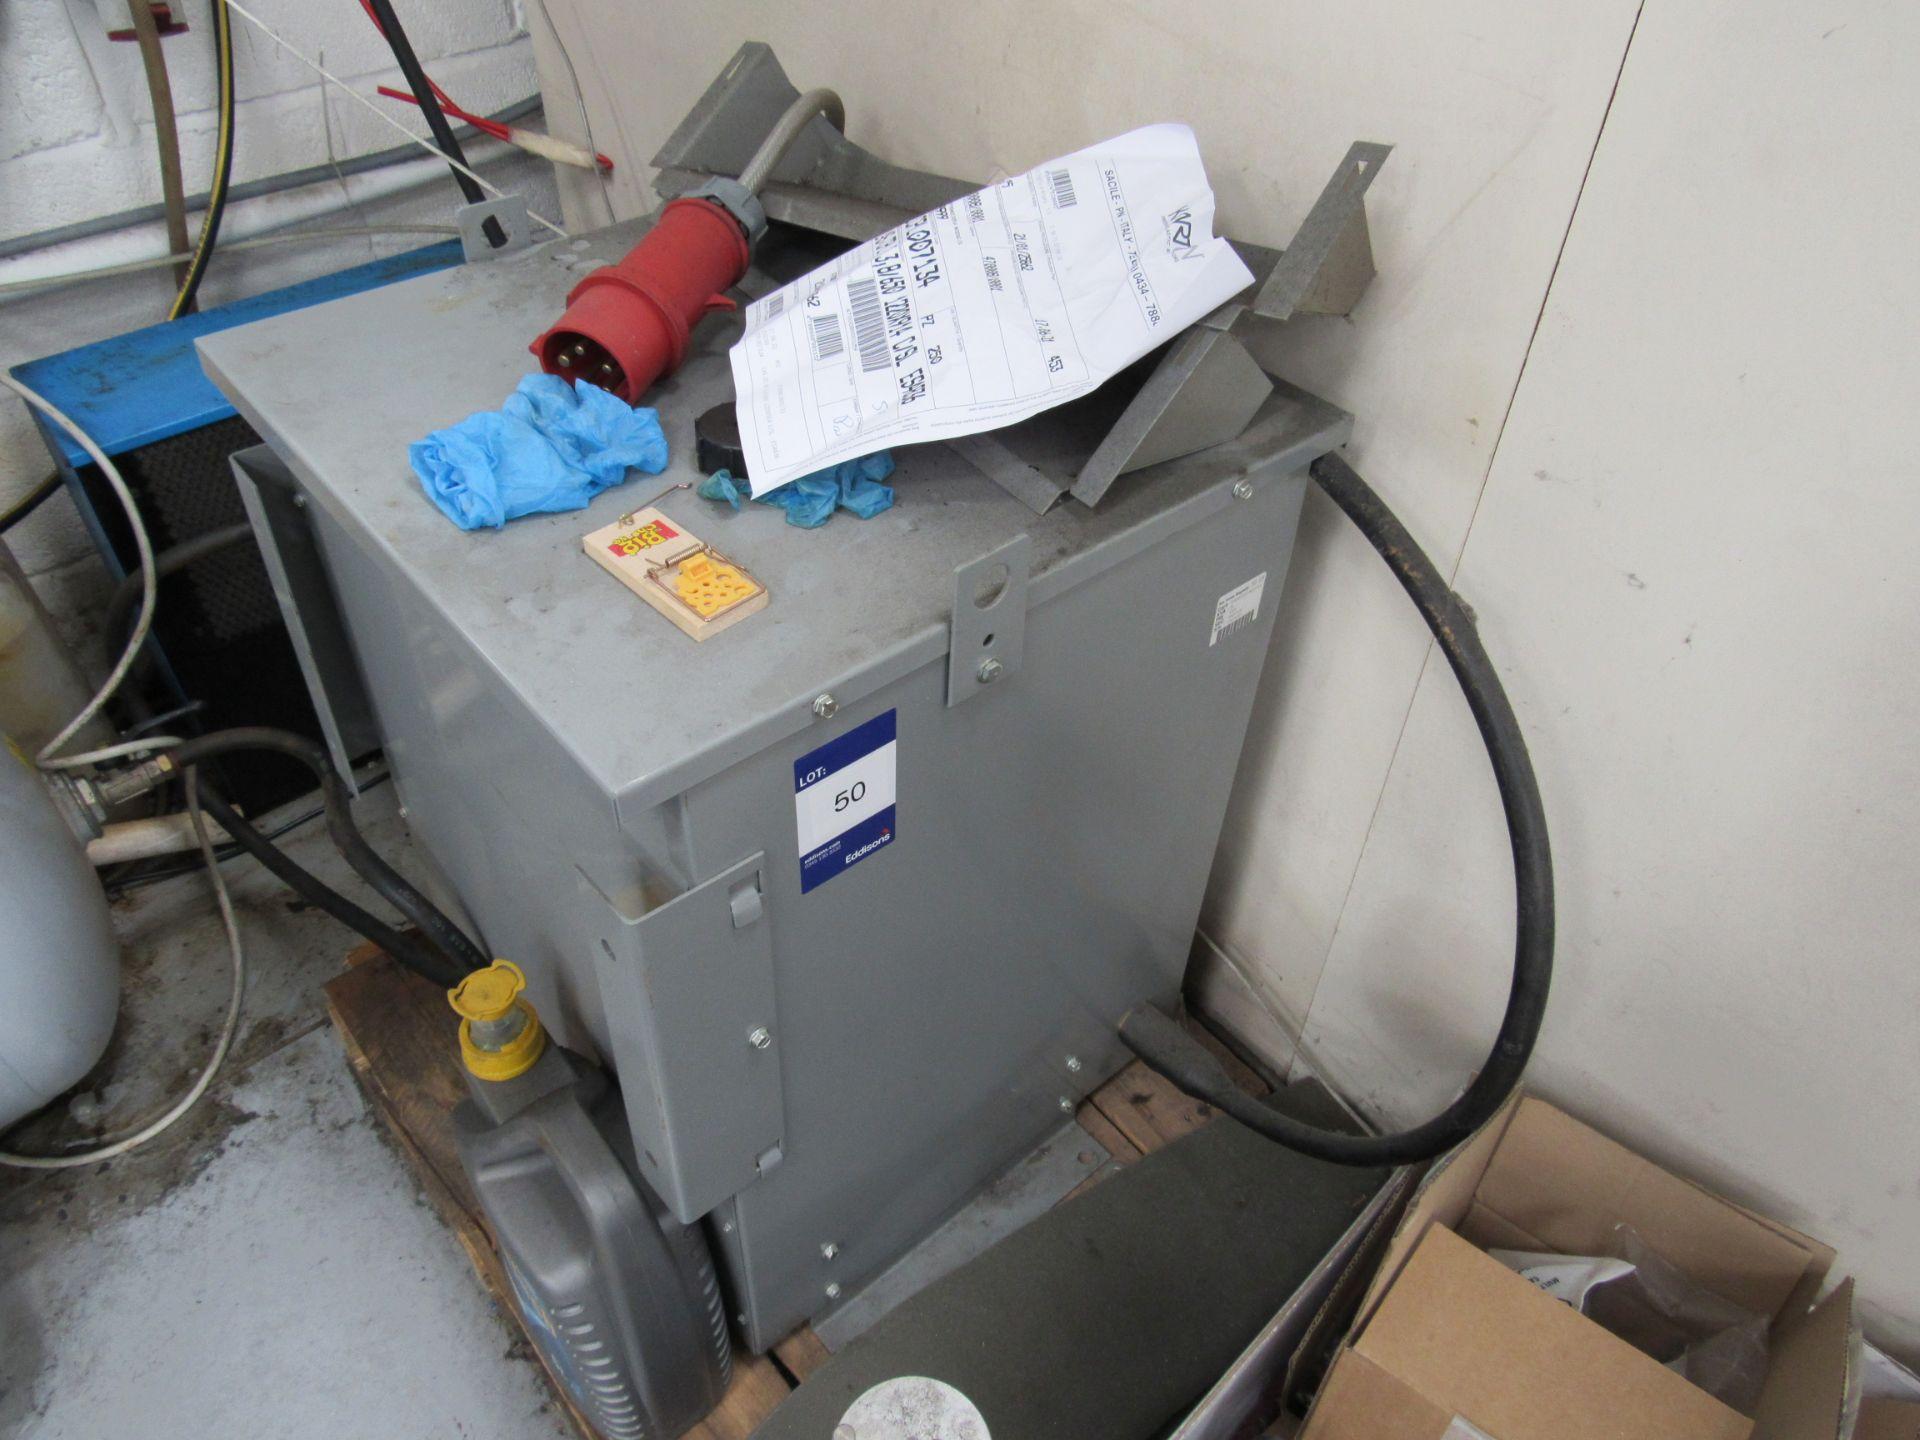 Rex Power Magnetic 30KVA 208Y/120Tranformer Serial Number 15E13110 Cat #, BA30GG1F-M/50/E3